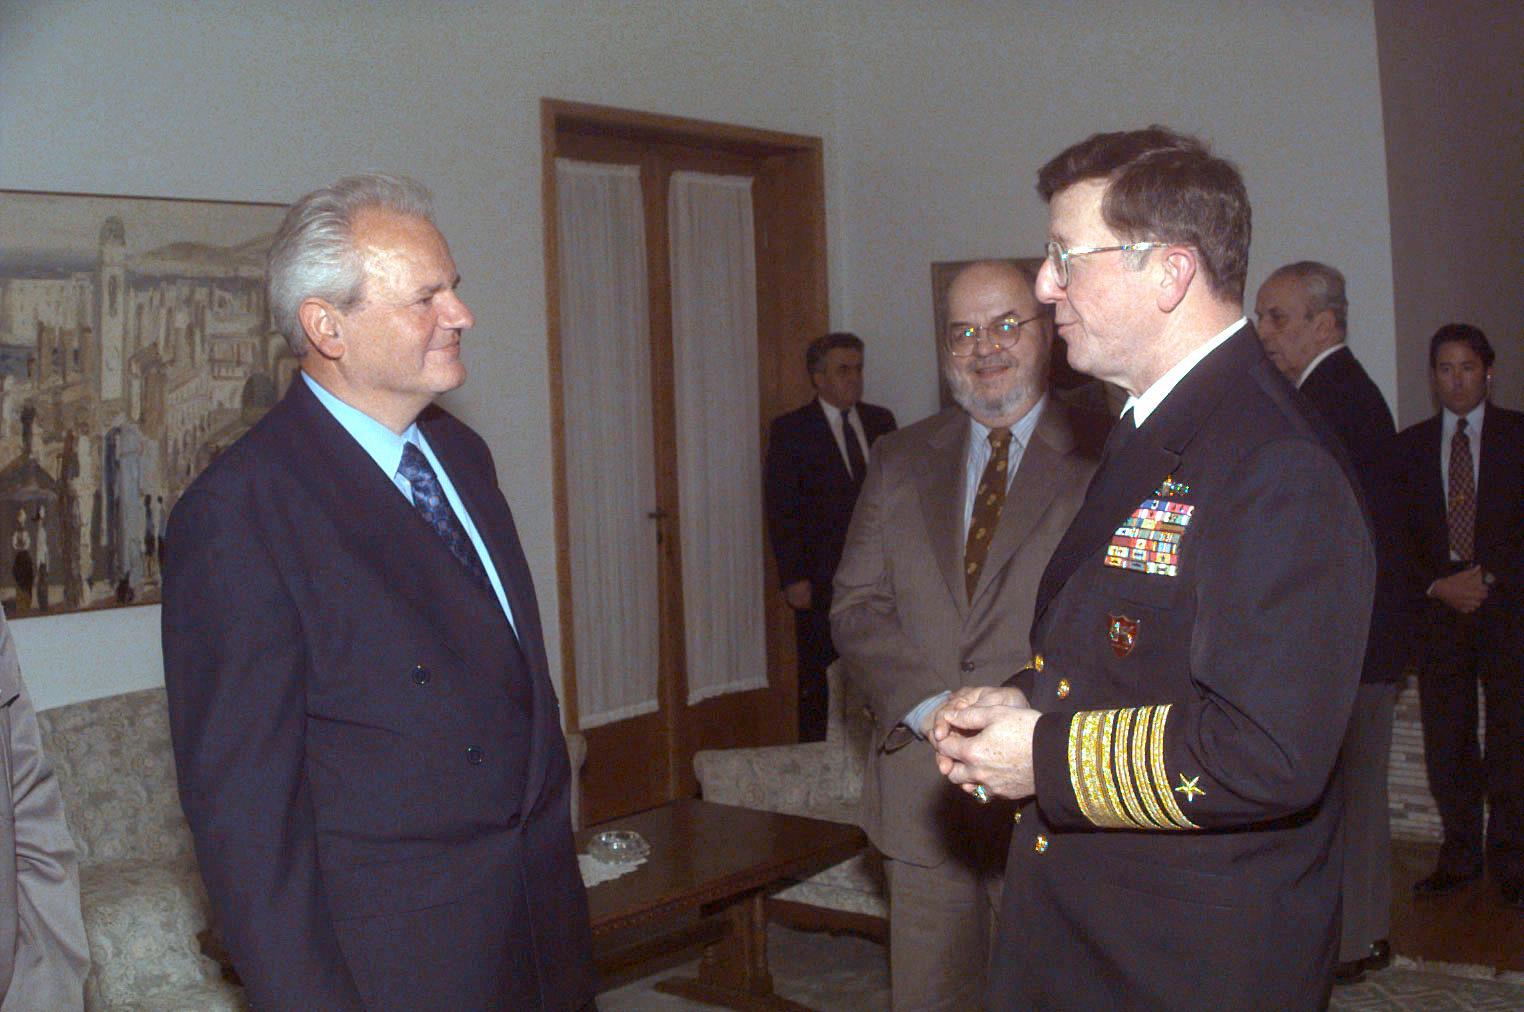 http://upload.wikimedia.org/wikipedia/commons/3/31/Slobodan_Milosevic_and_Joseph_Lopez_330-CFD-DF-SD-03-00767.jpeg